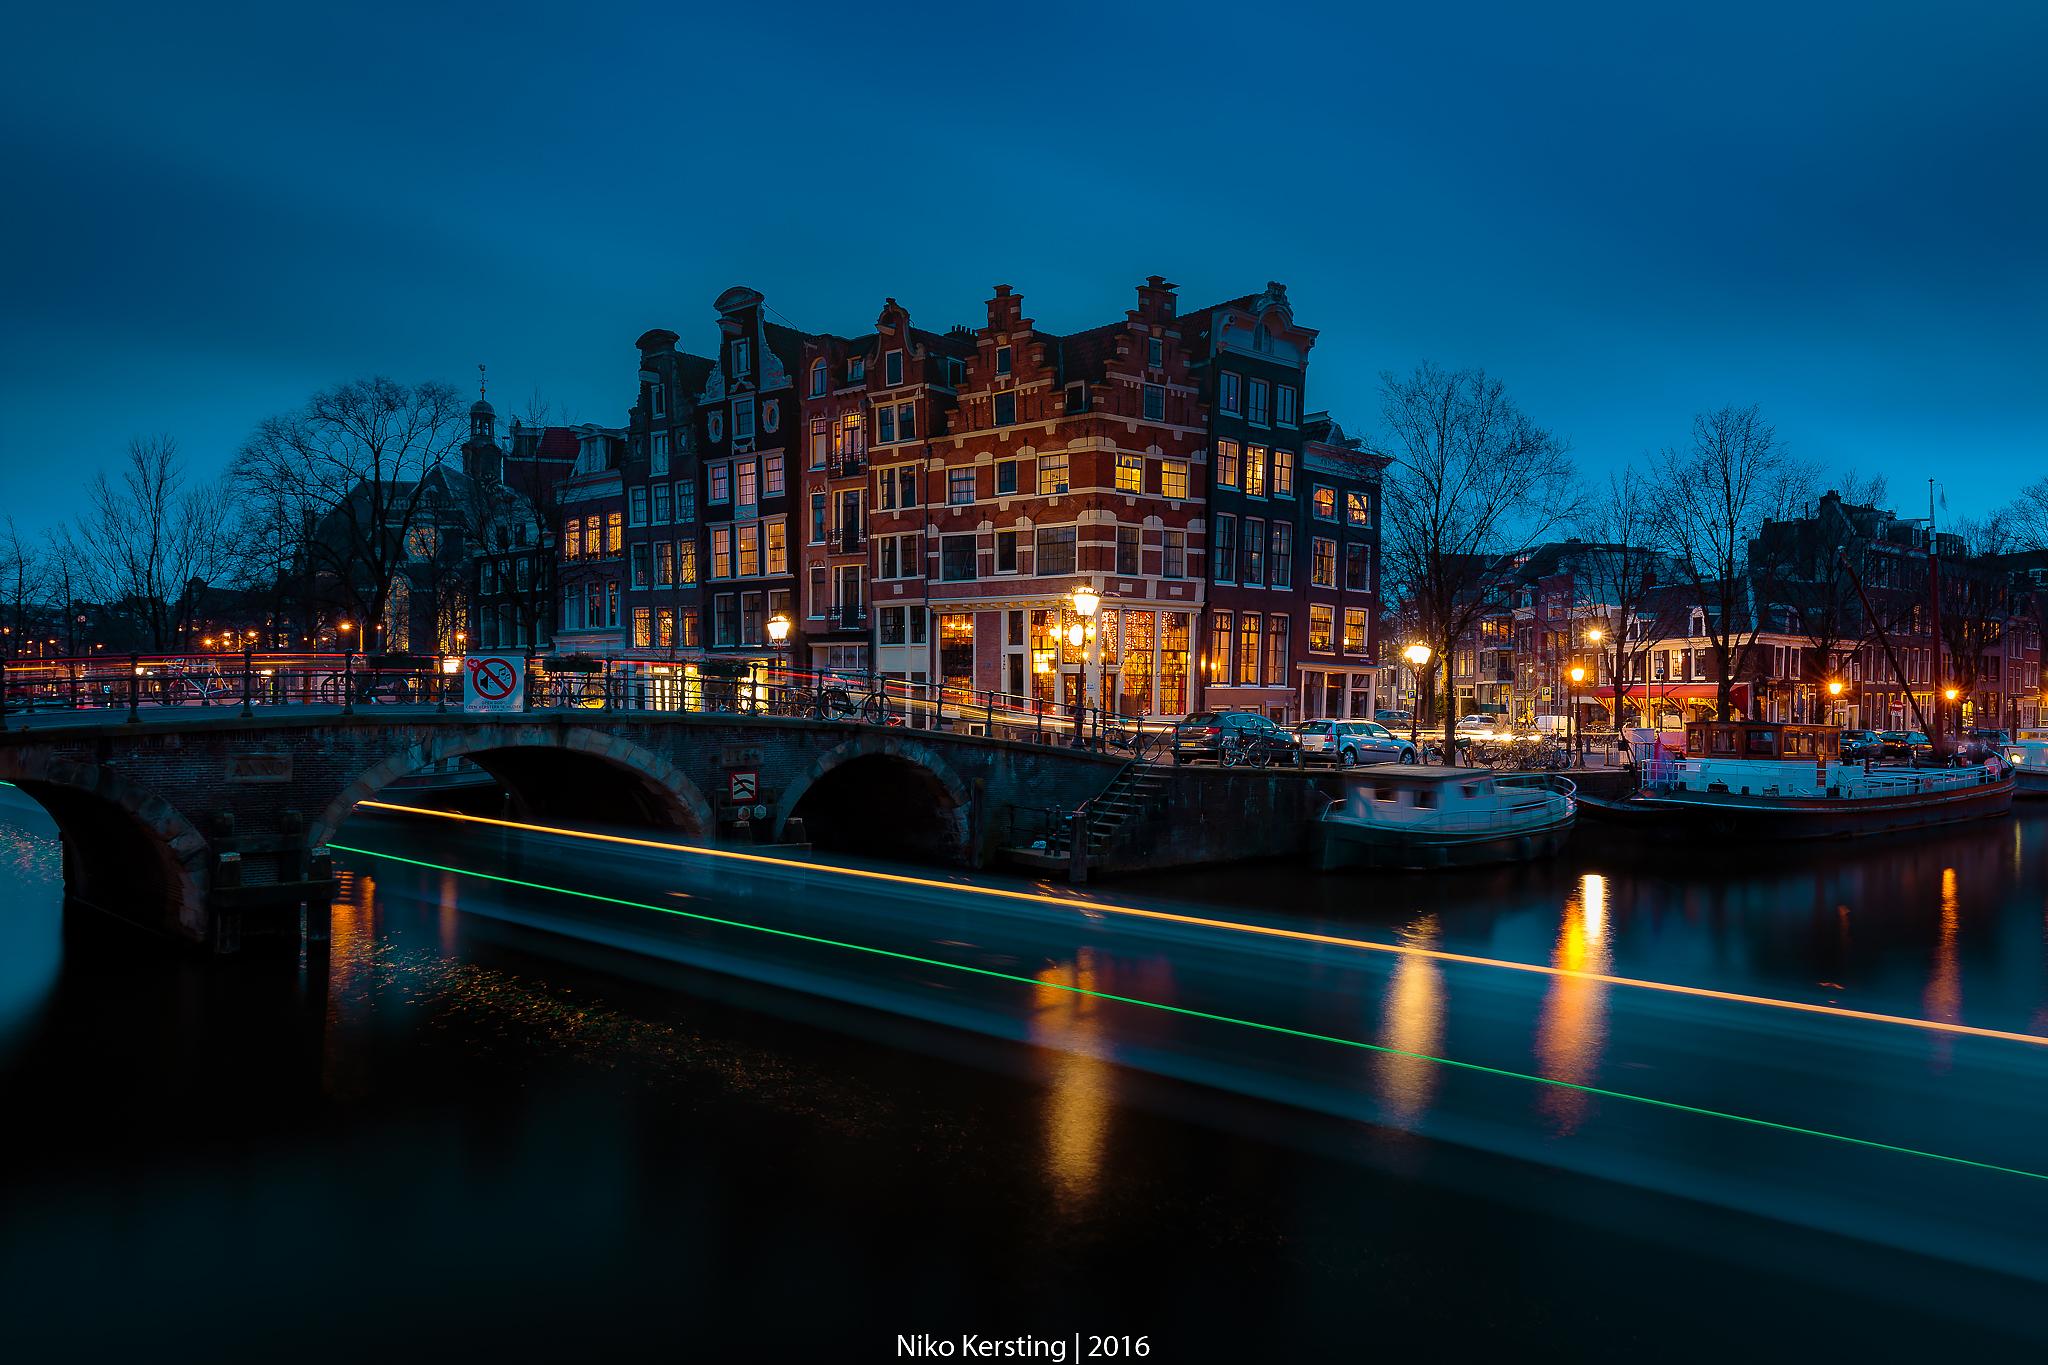 Brouwersgracht x Prinsengracht, Netherlands